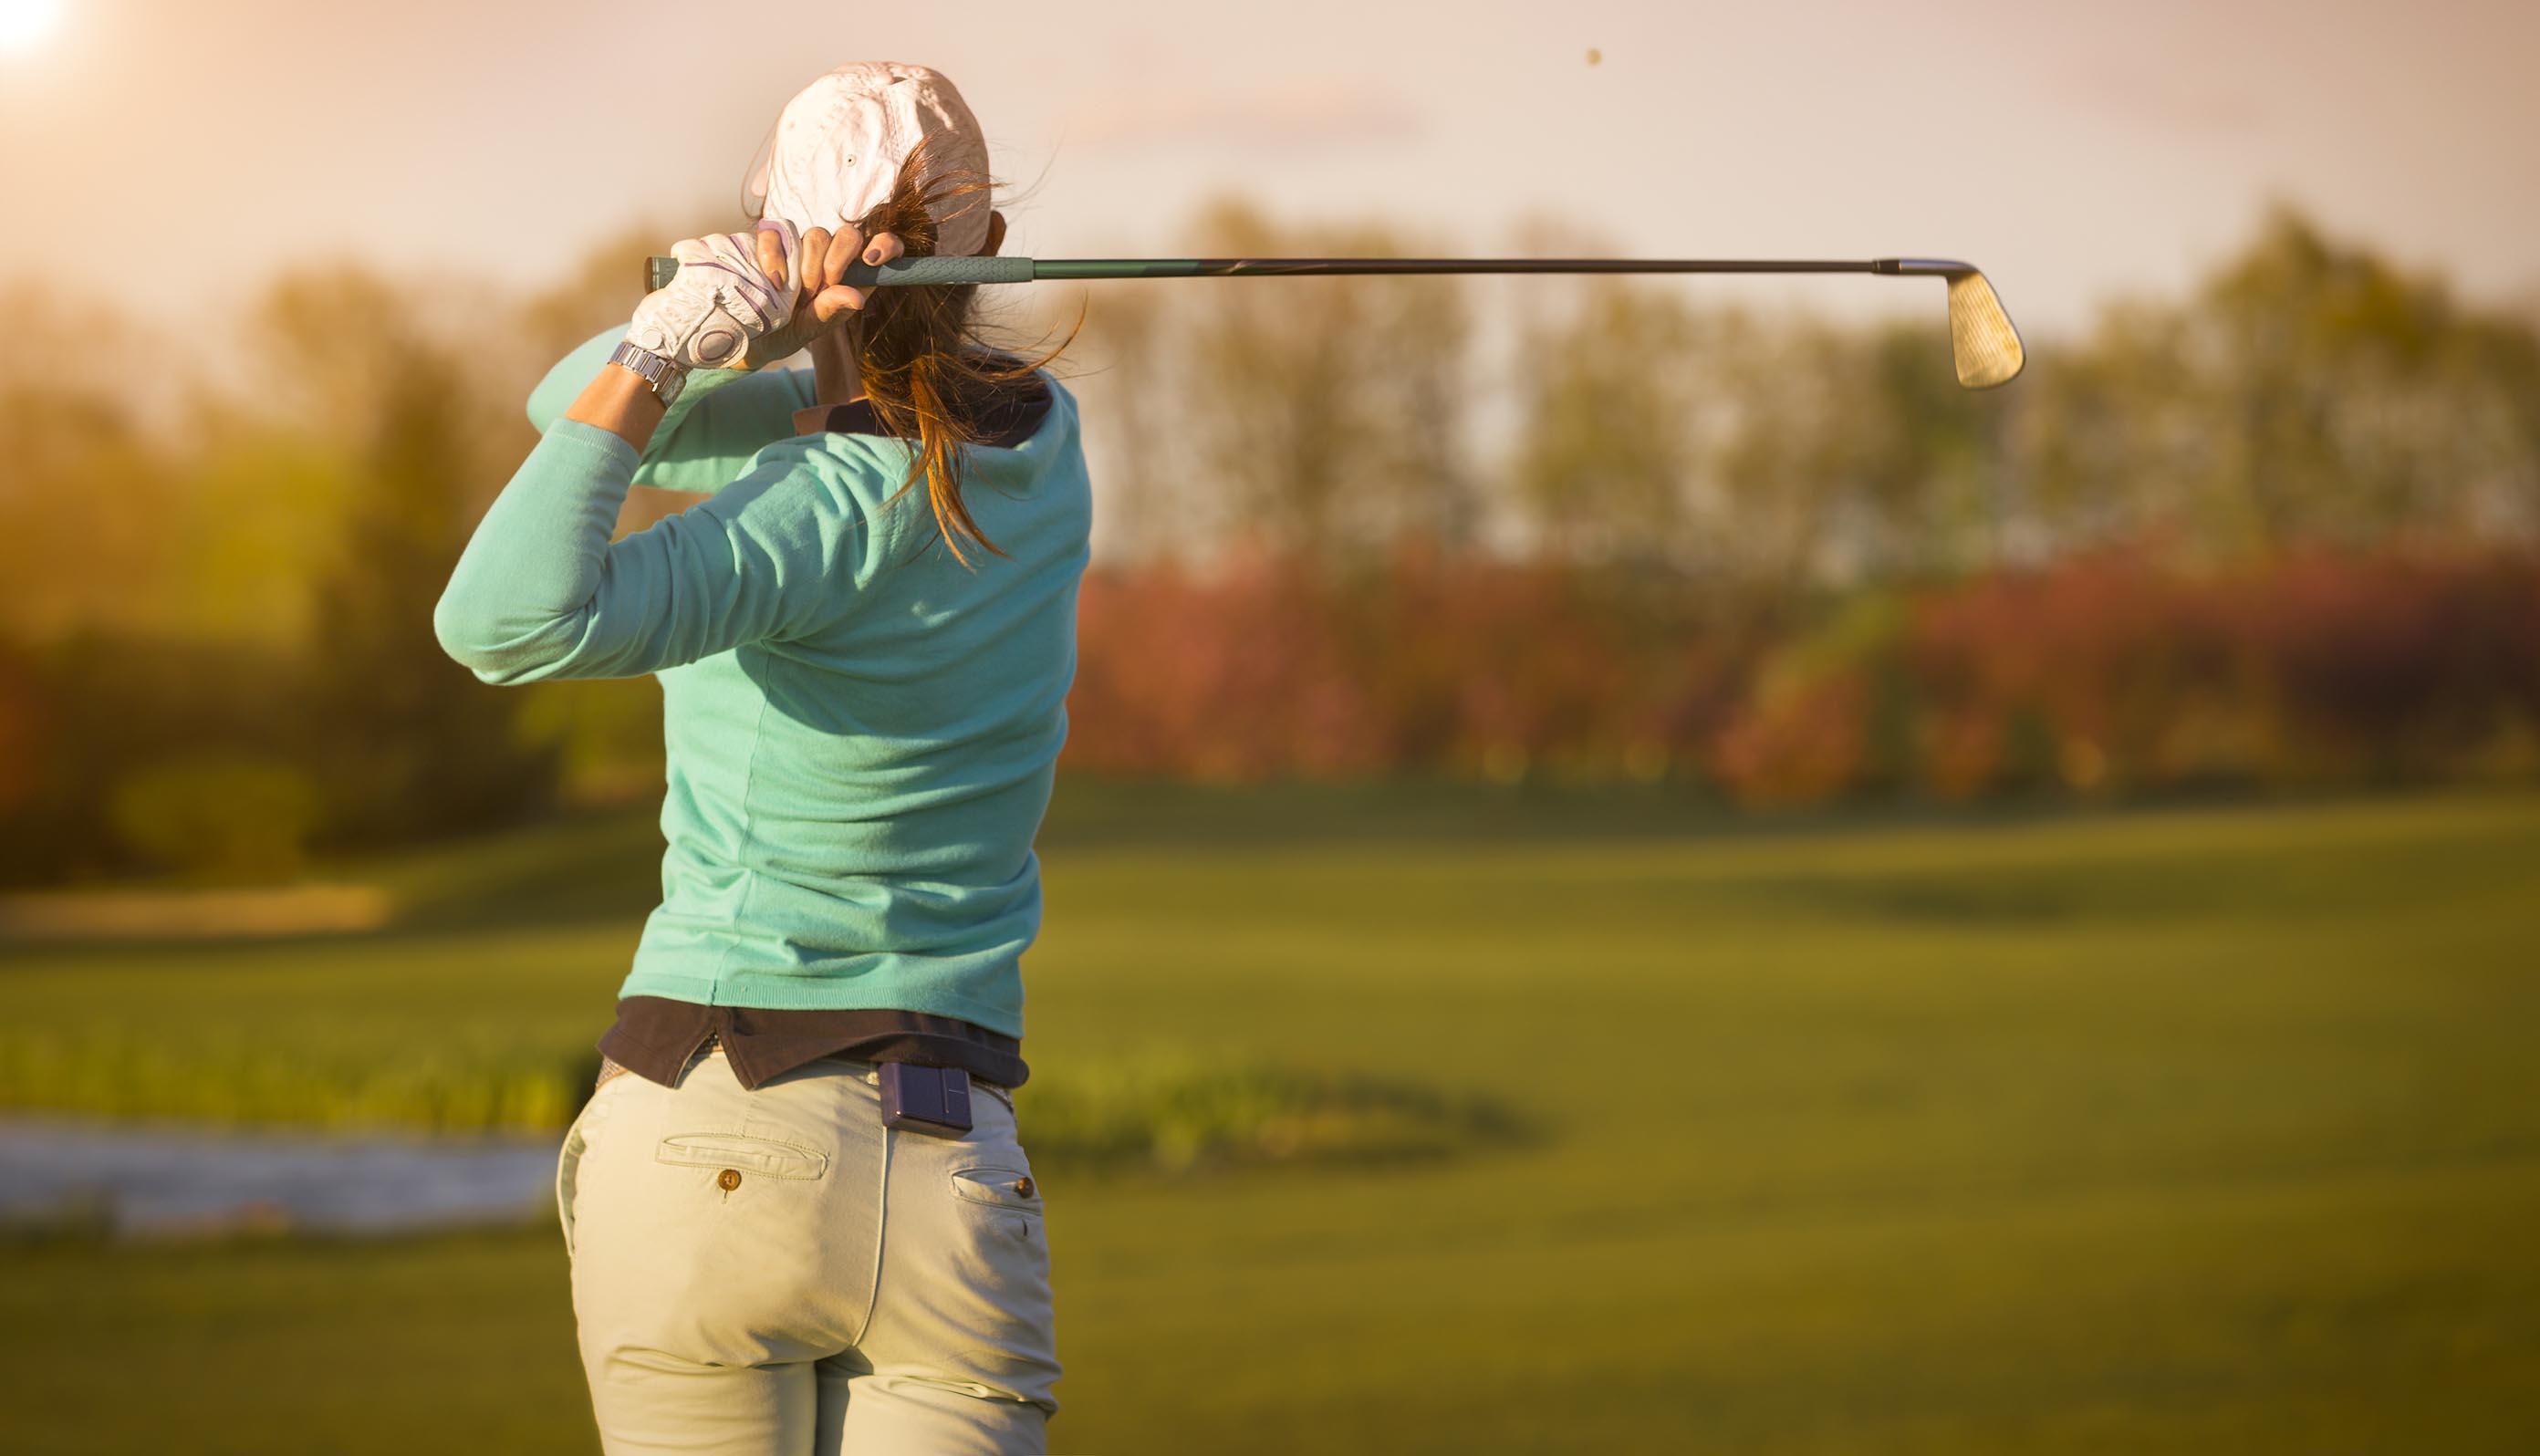 donne-e-golf-Italy4golf